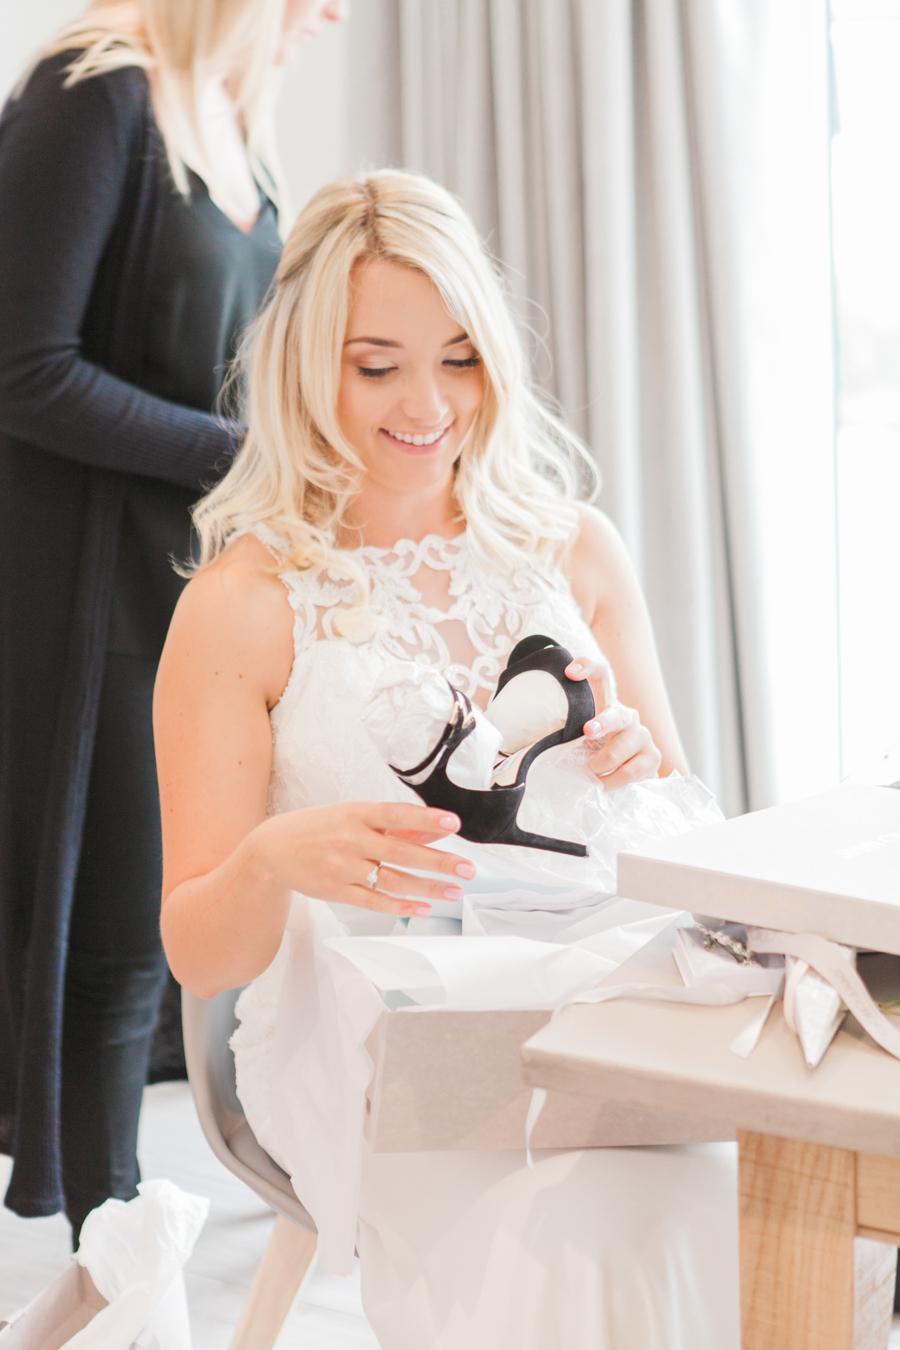 Gifts for husbands morning of wedding, image by Amanda Karen Photography (16)